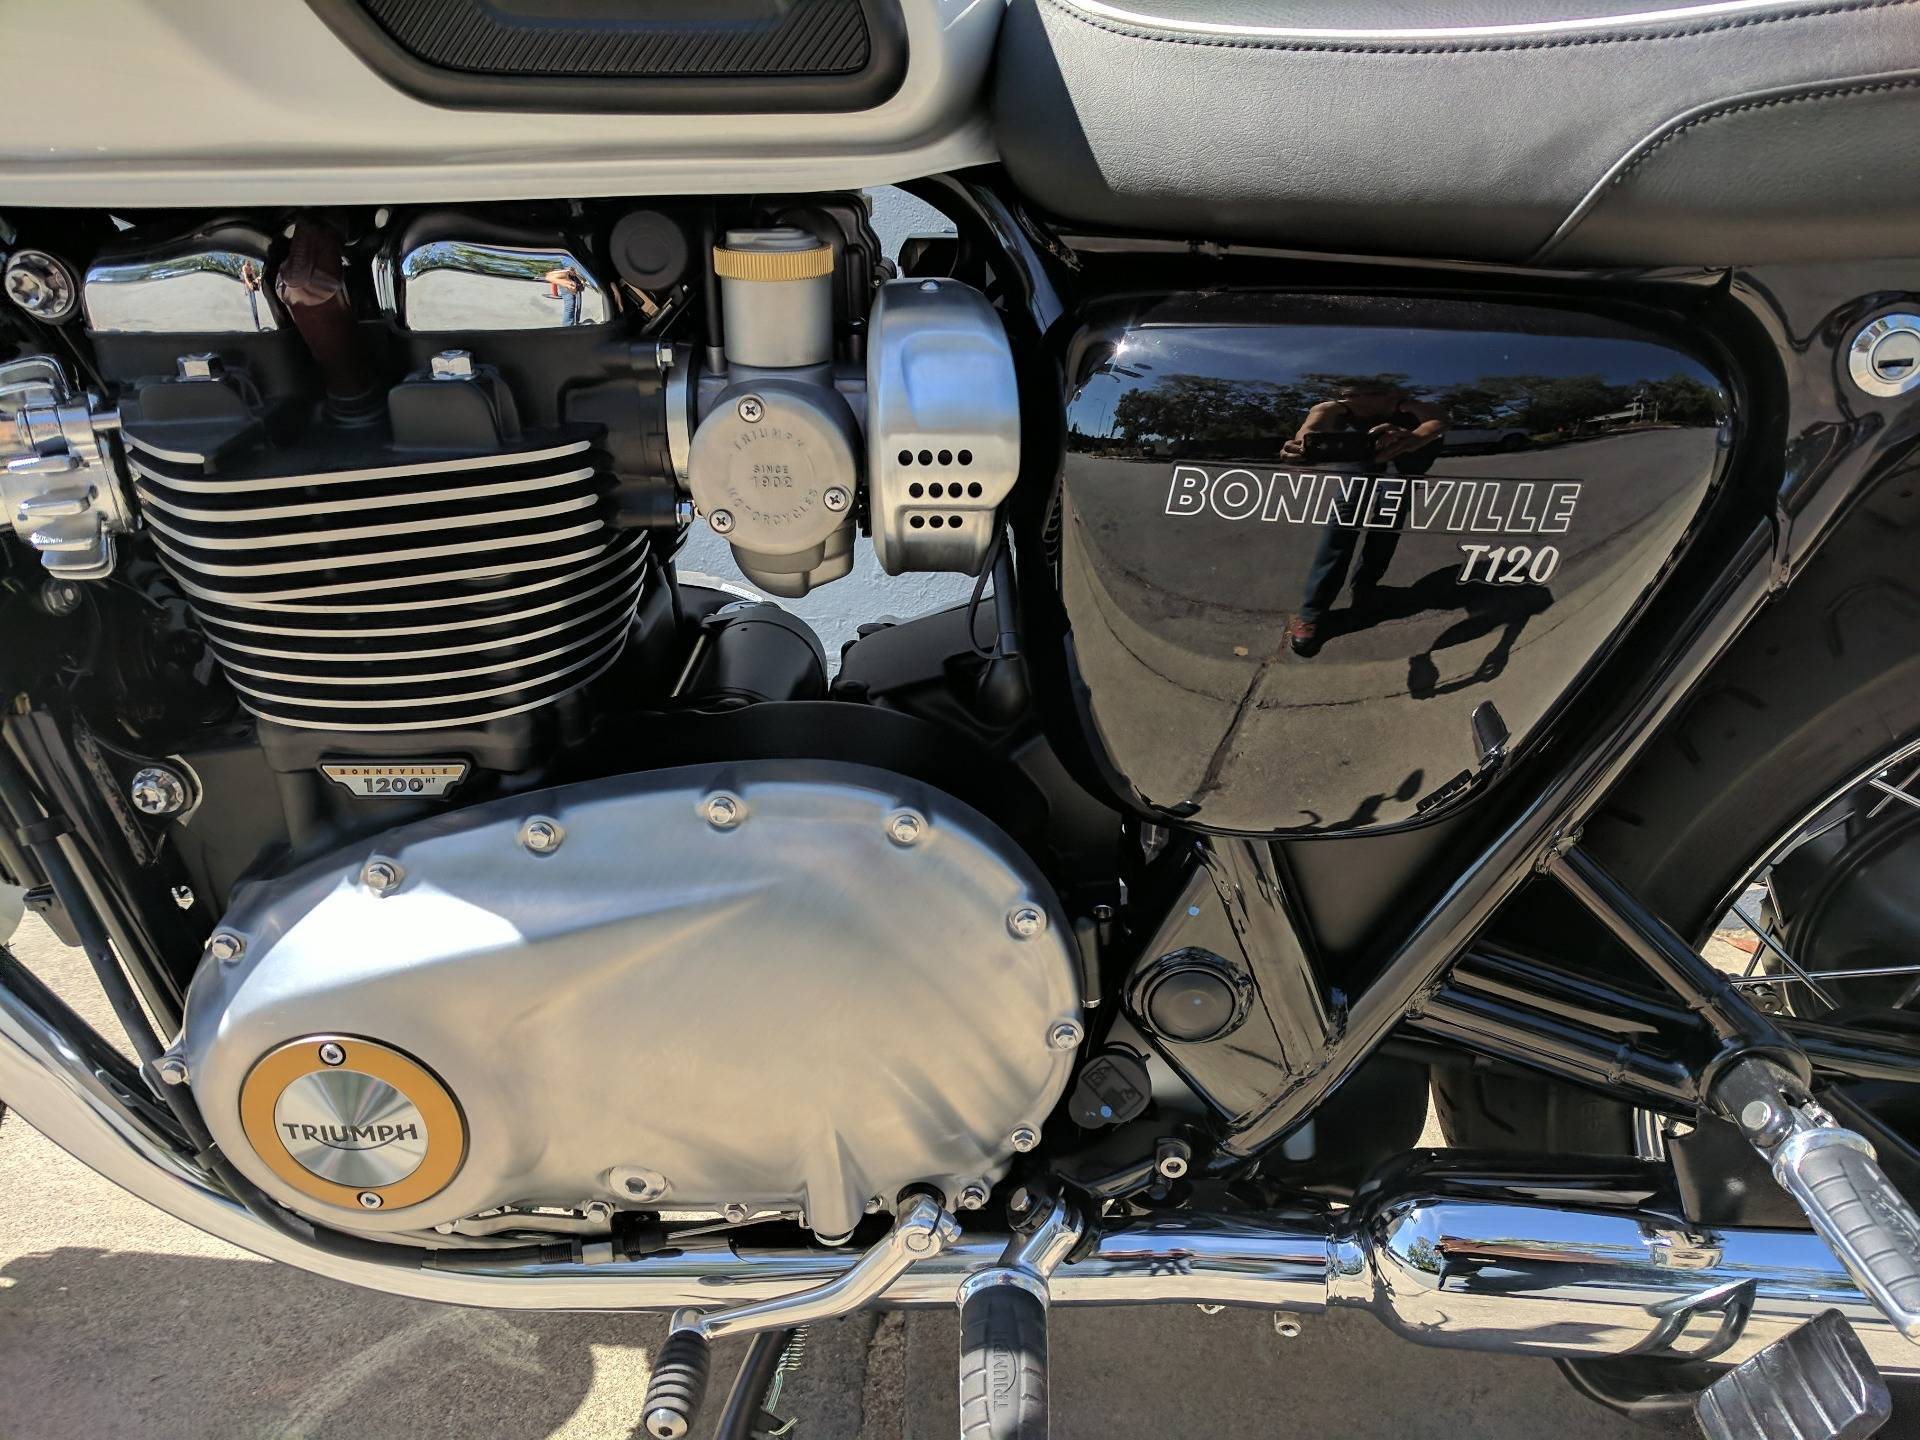 New 2019 Triumph Bonneville T120 Motorcycles In San Jose Ca Stock